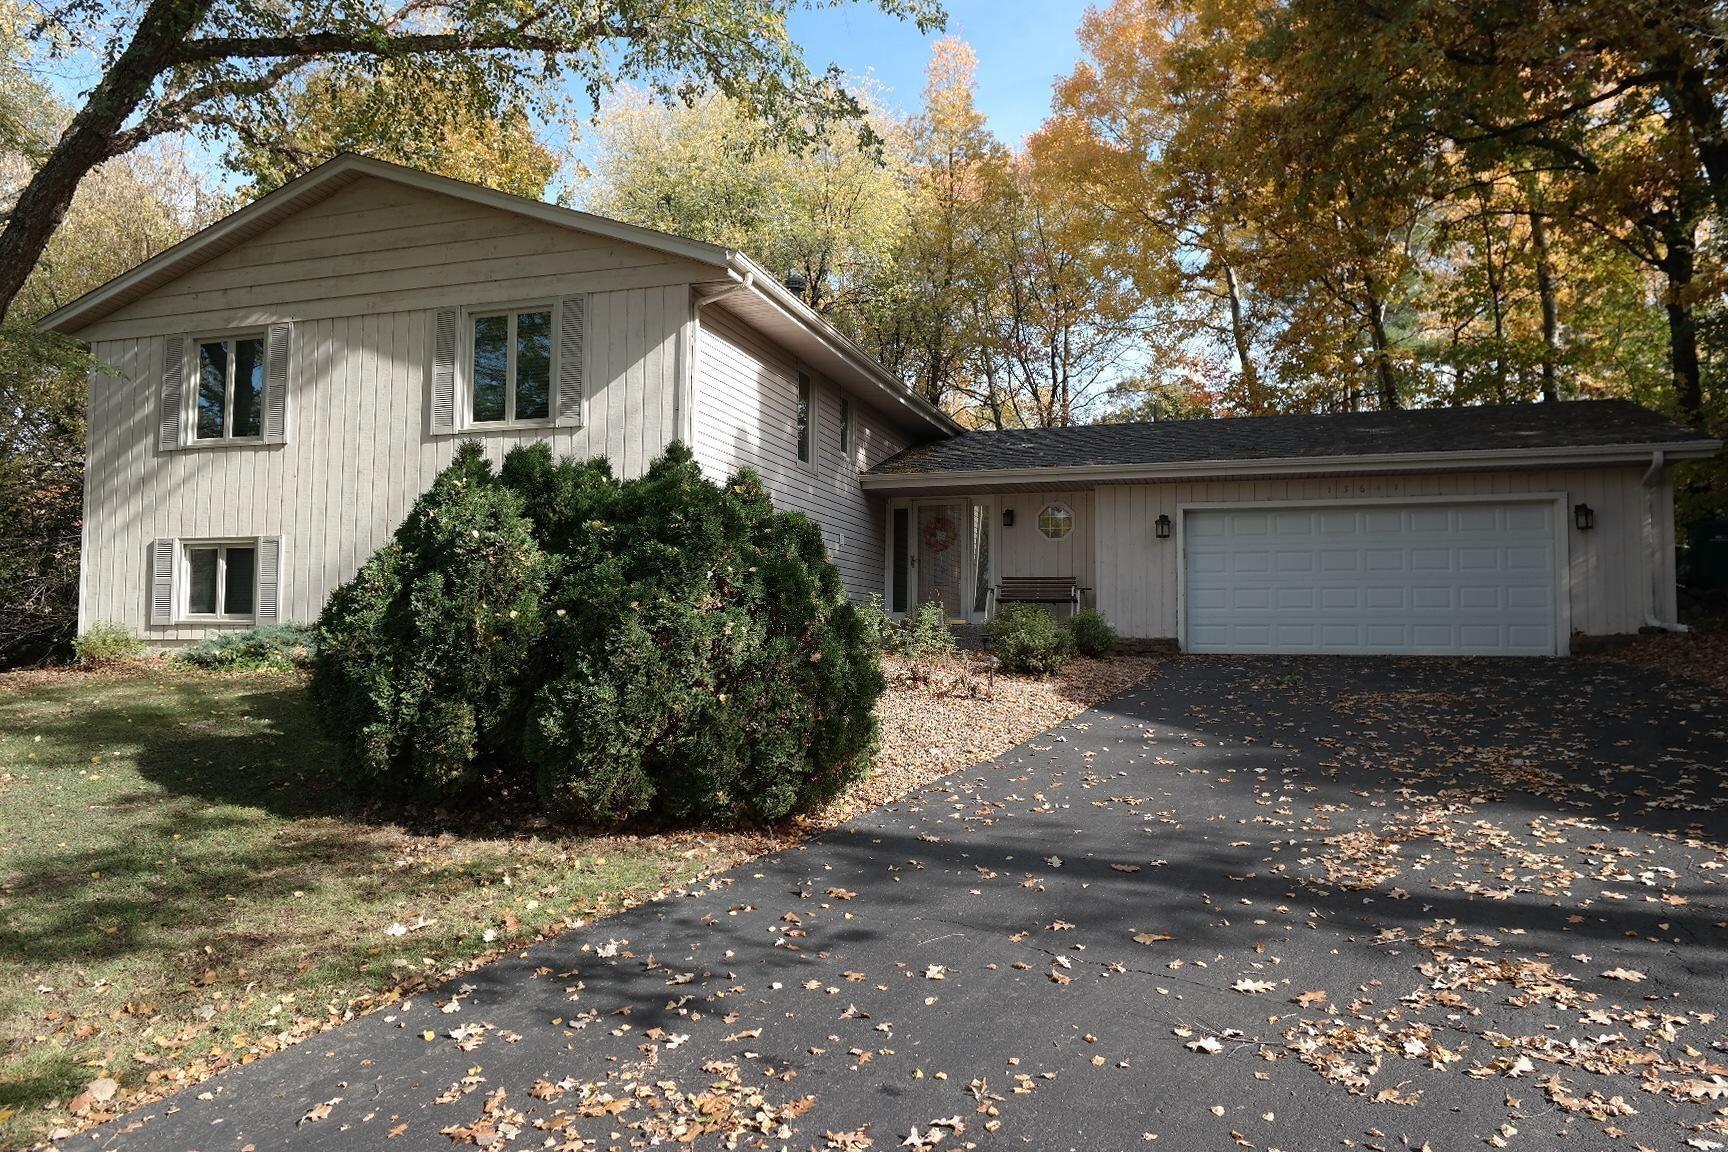 Photo of 13641 Krestwood Drive, Burnsville, MN 55337 (MLS # 6119063)